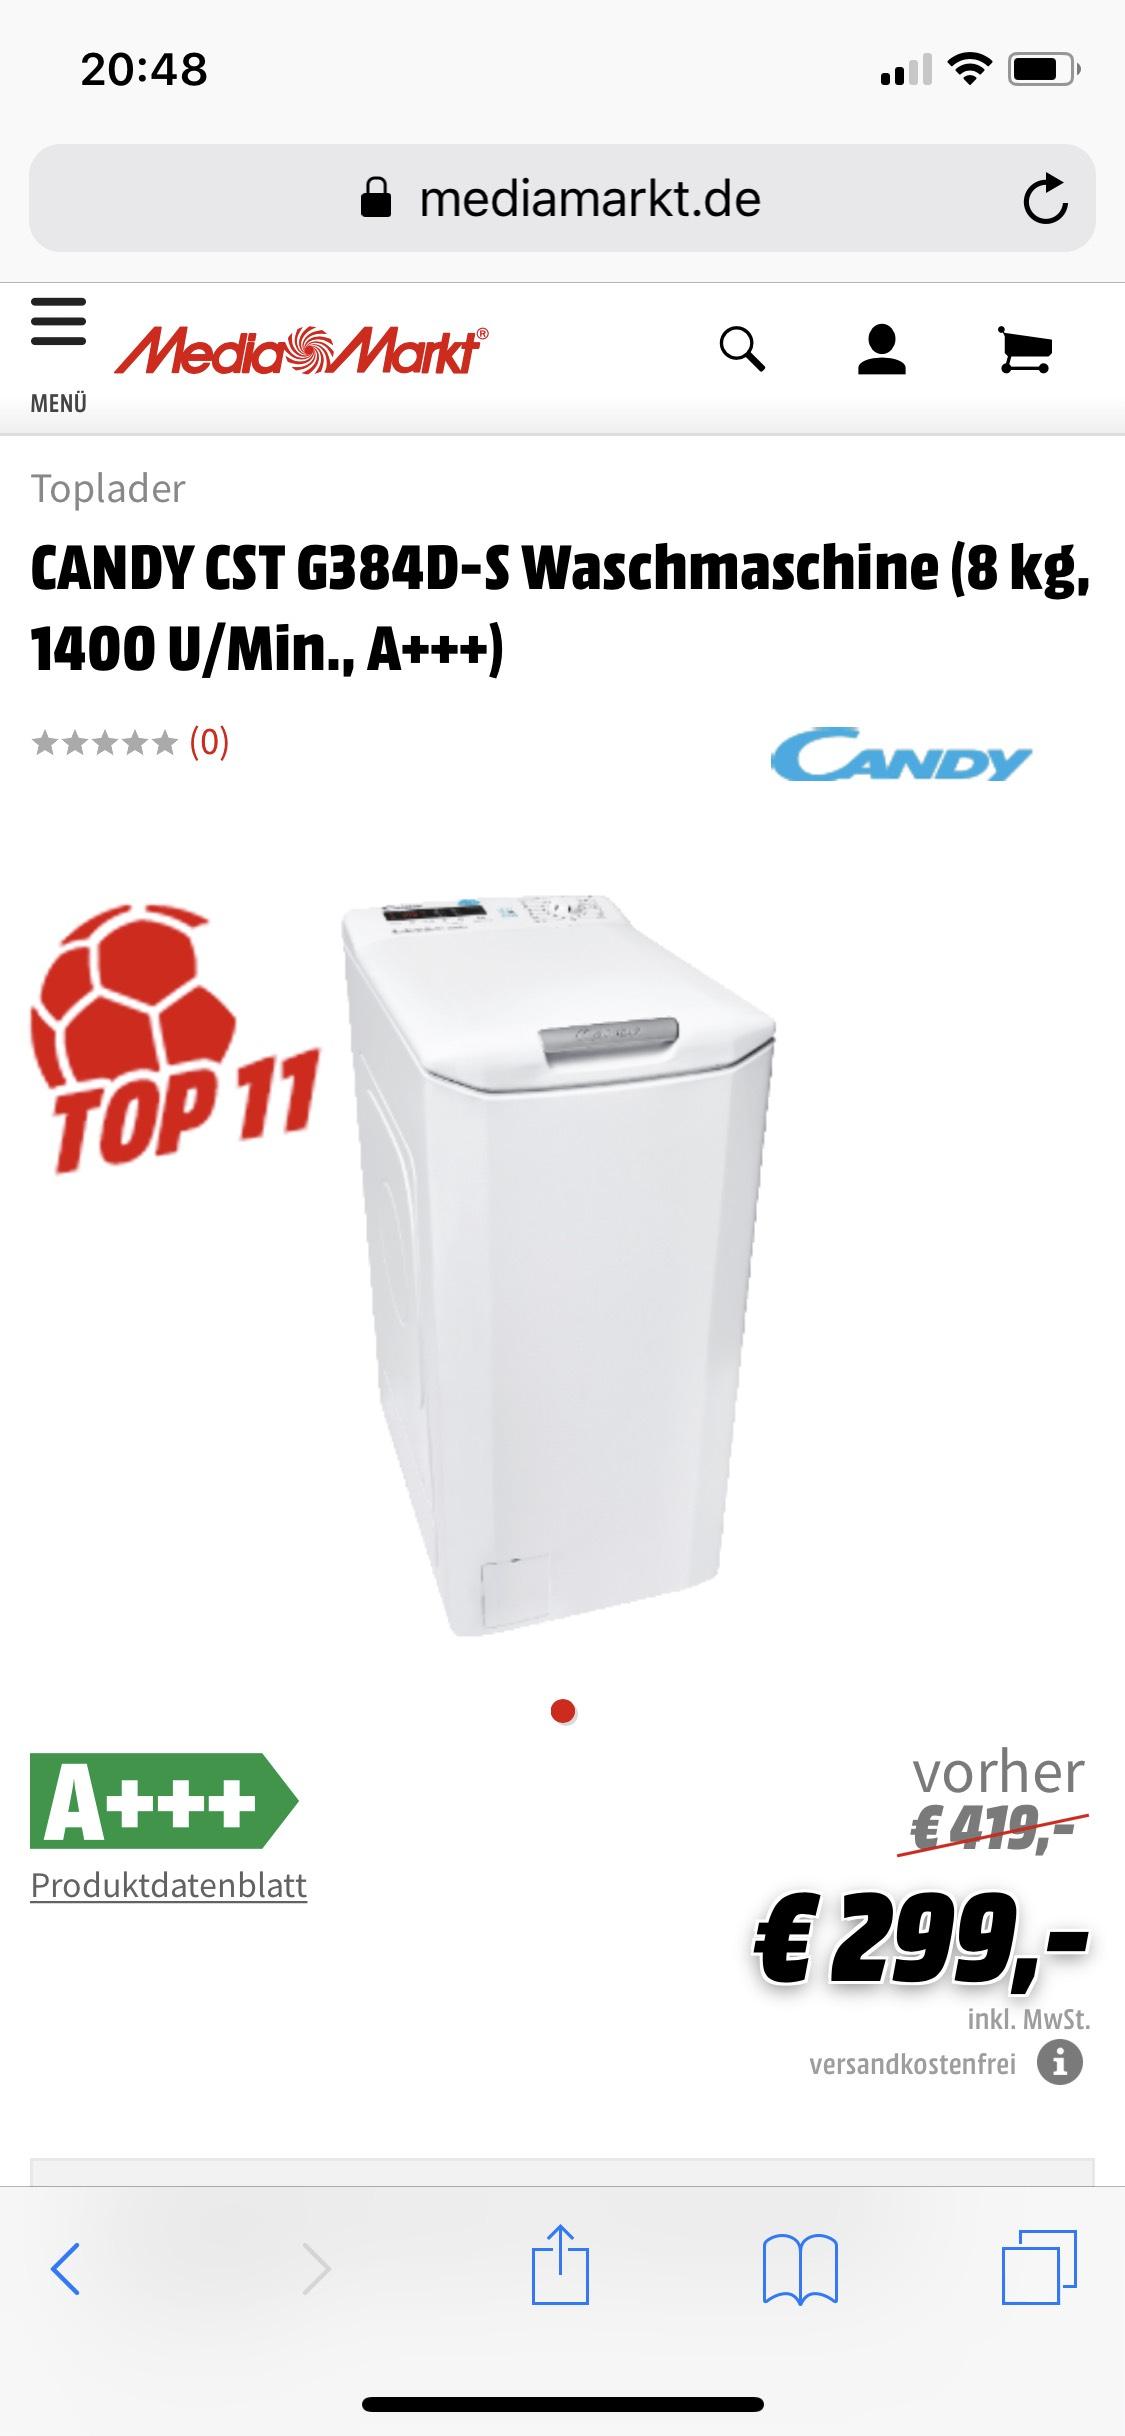 [Media Markt Online] CANDY CST G384D-S Toplader Waschmaschine (8 kg, 1400 U/Min., A+++)